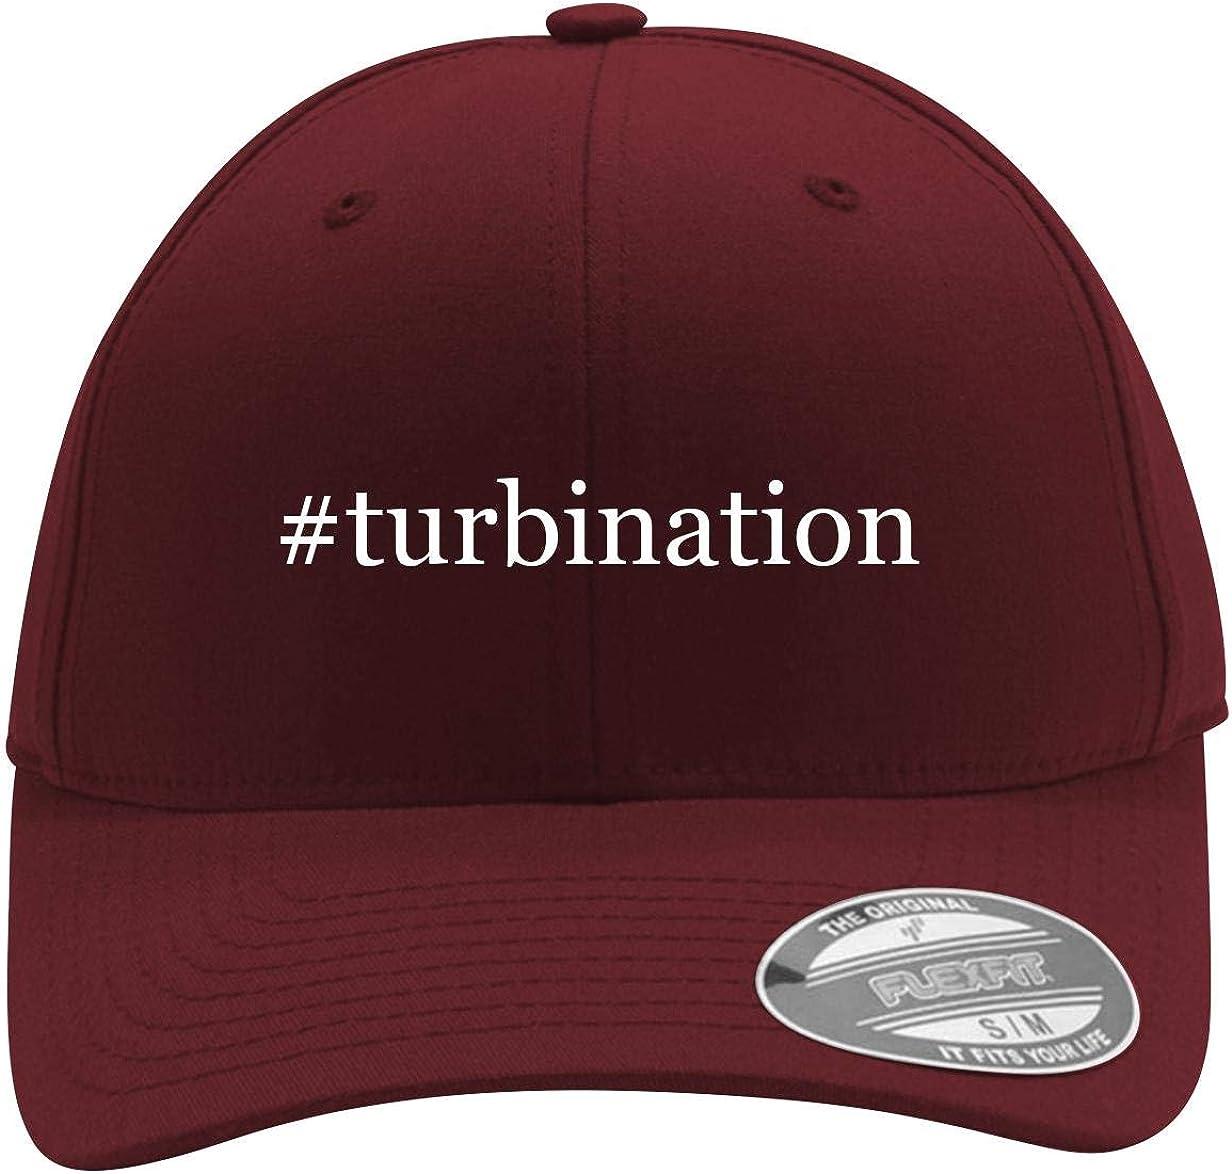 #Turbination - Men's Hashtag Flexfit Baseball Cap Hat